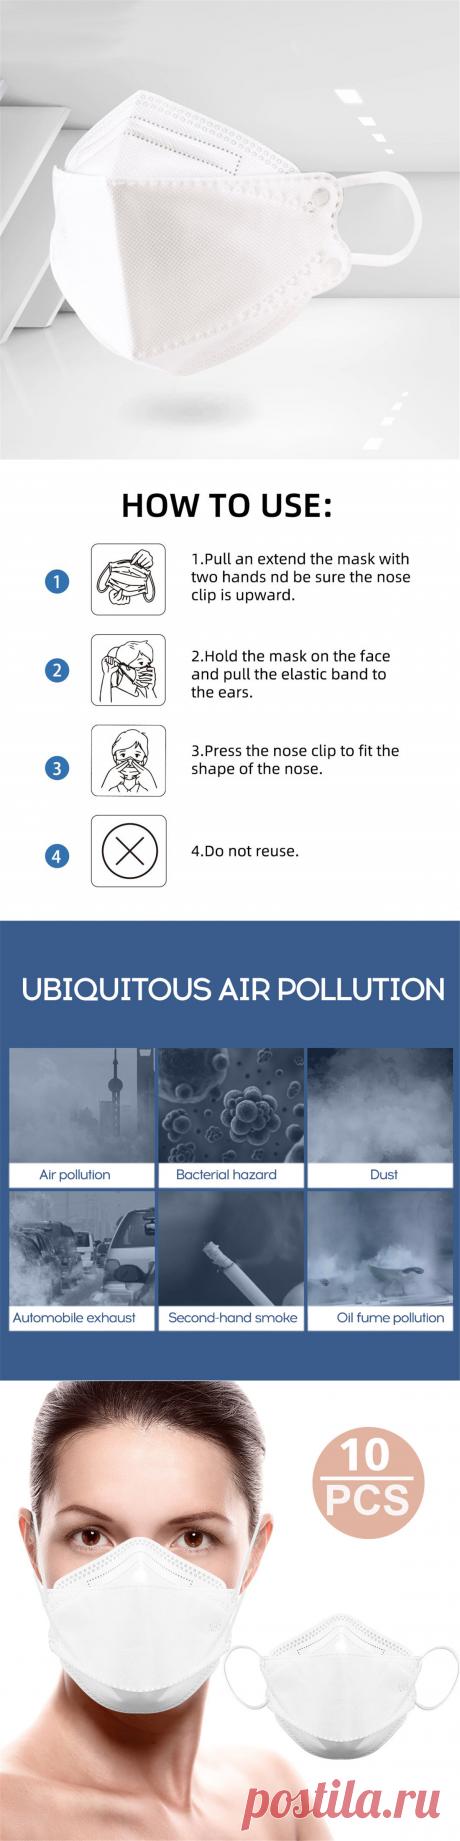 10pcs 95% anti air pollution face mask protection respirator at Banggood